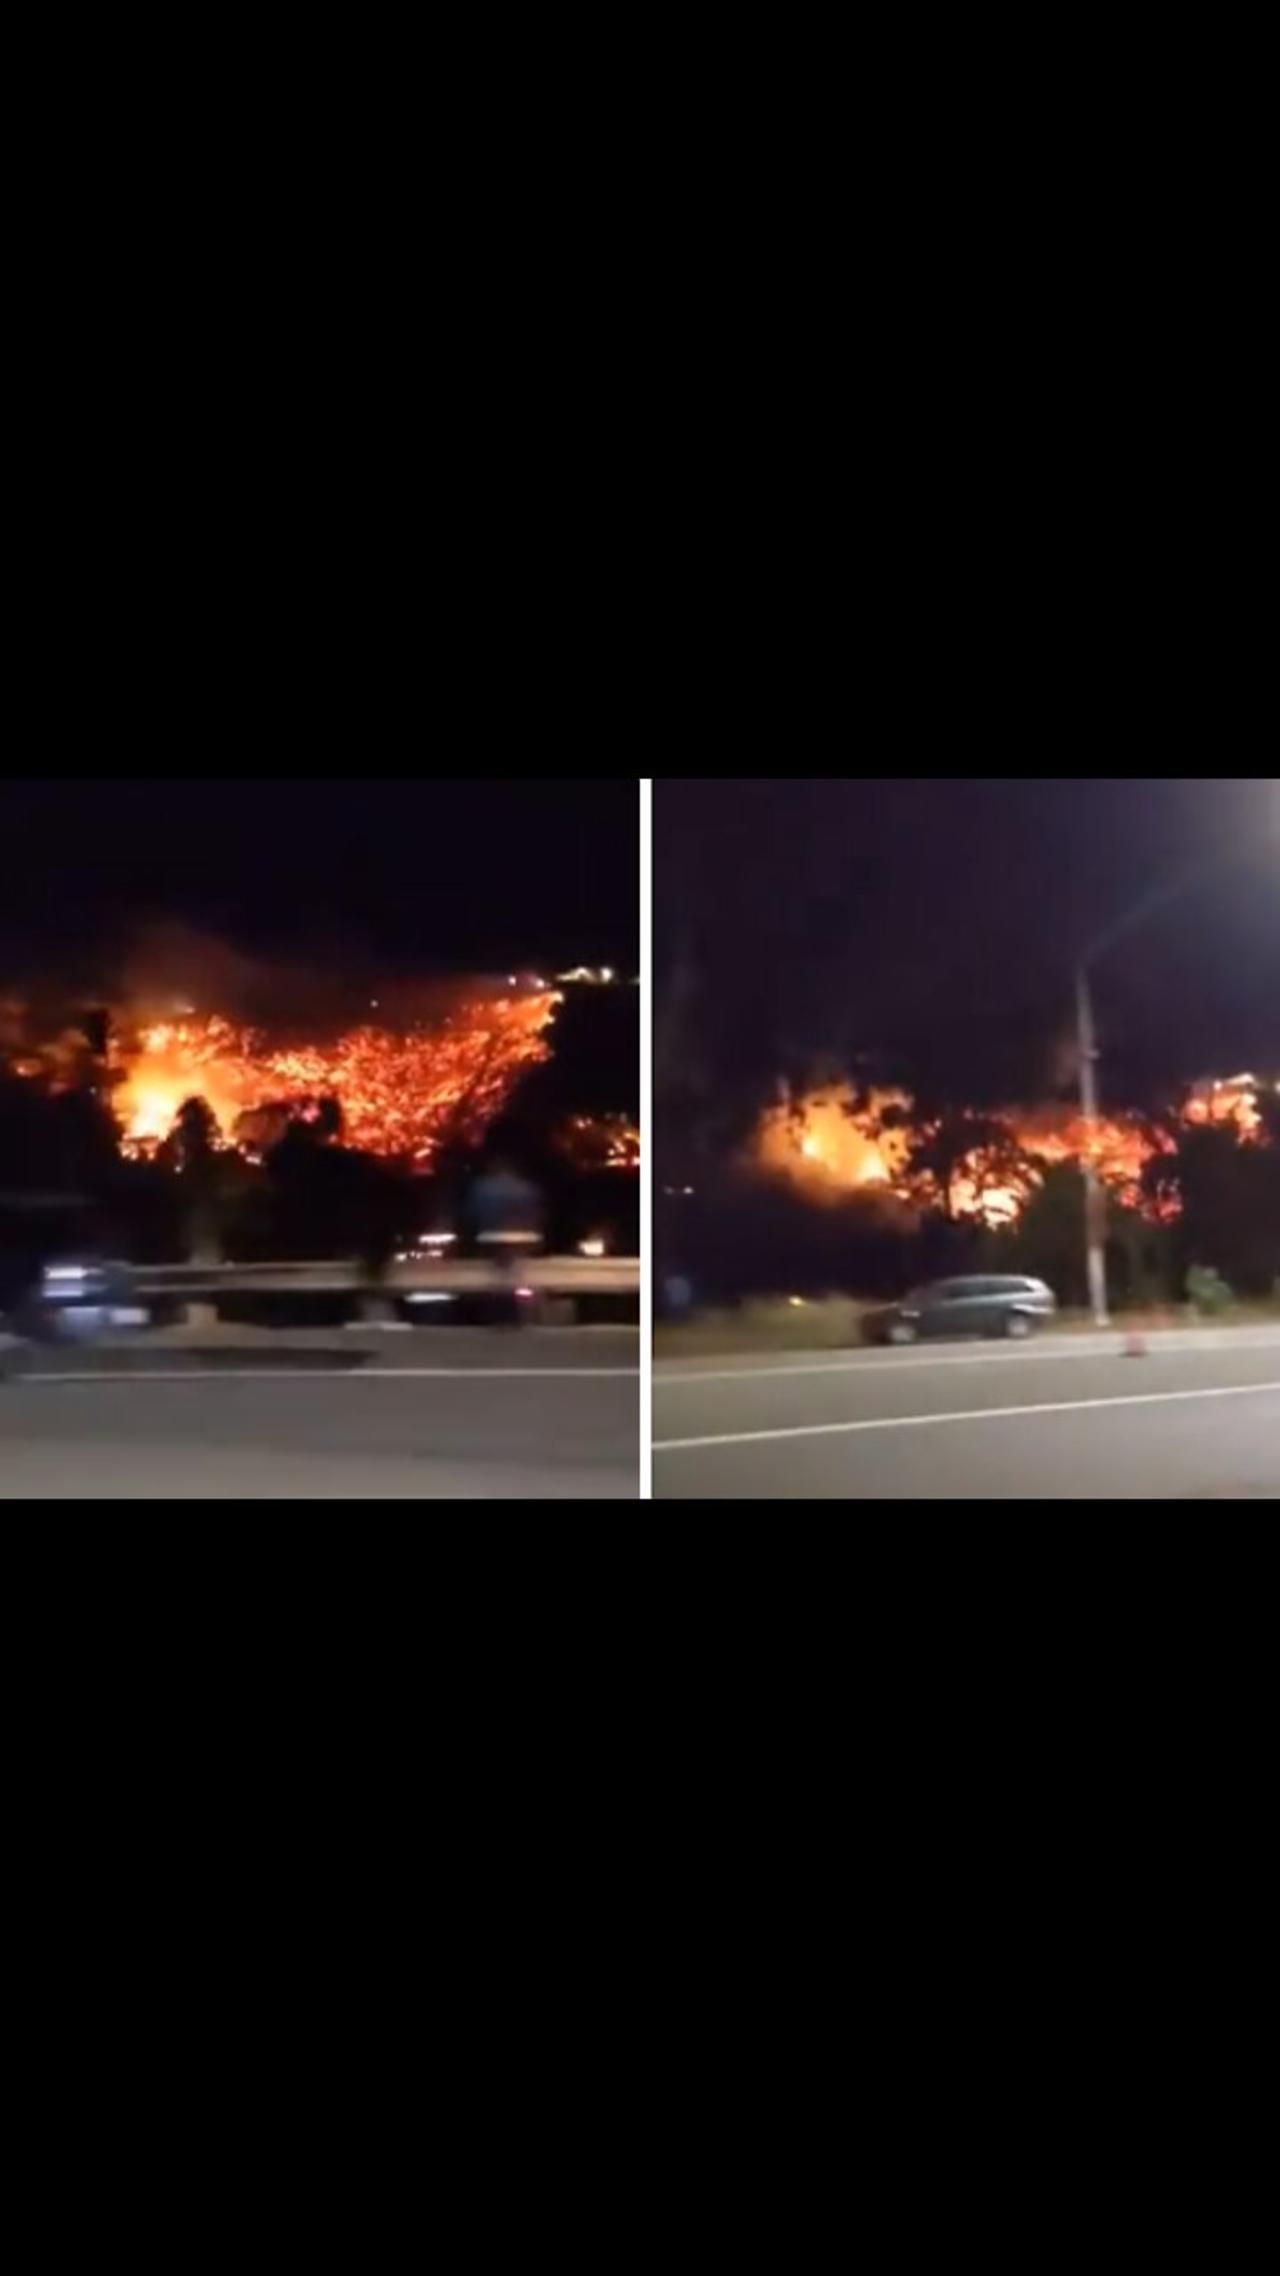 Raging wildfire in Santa Barbara captured on camera